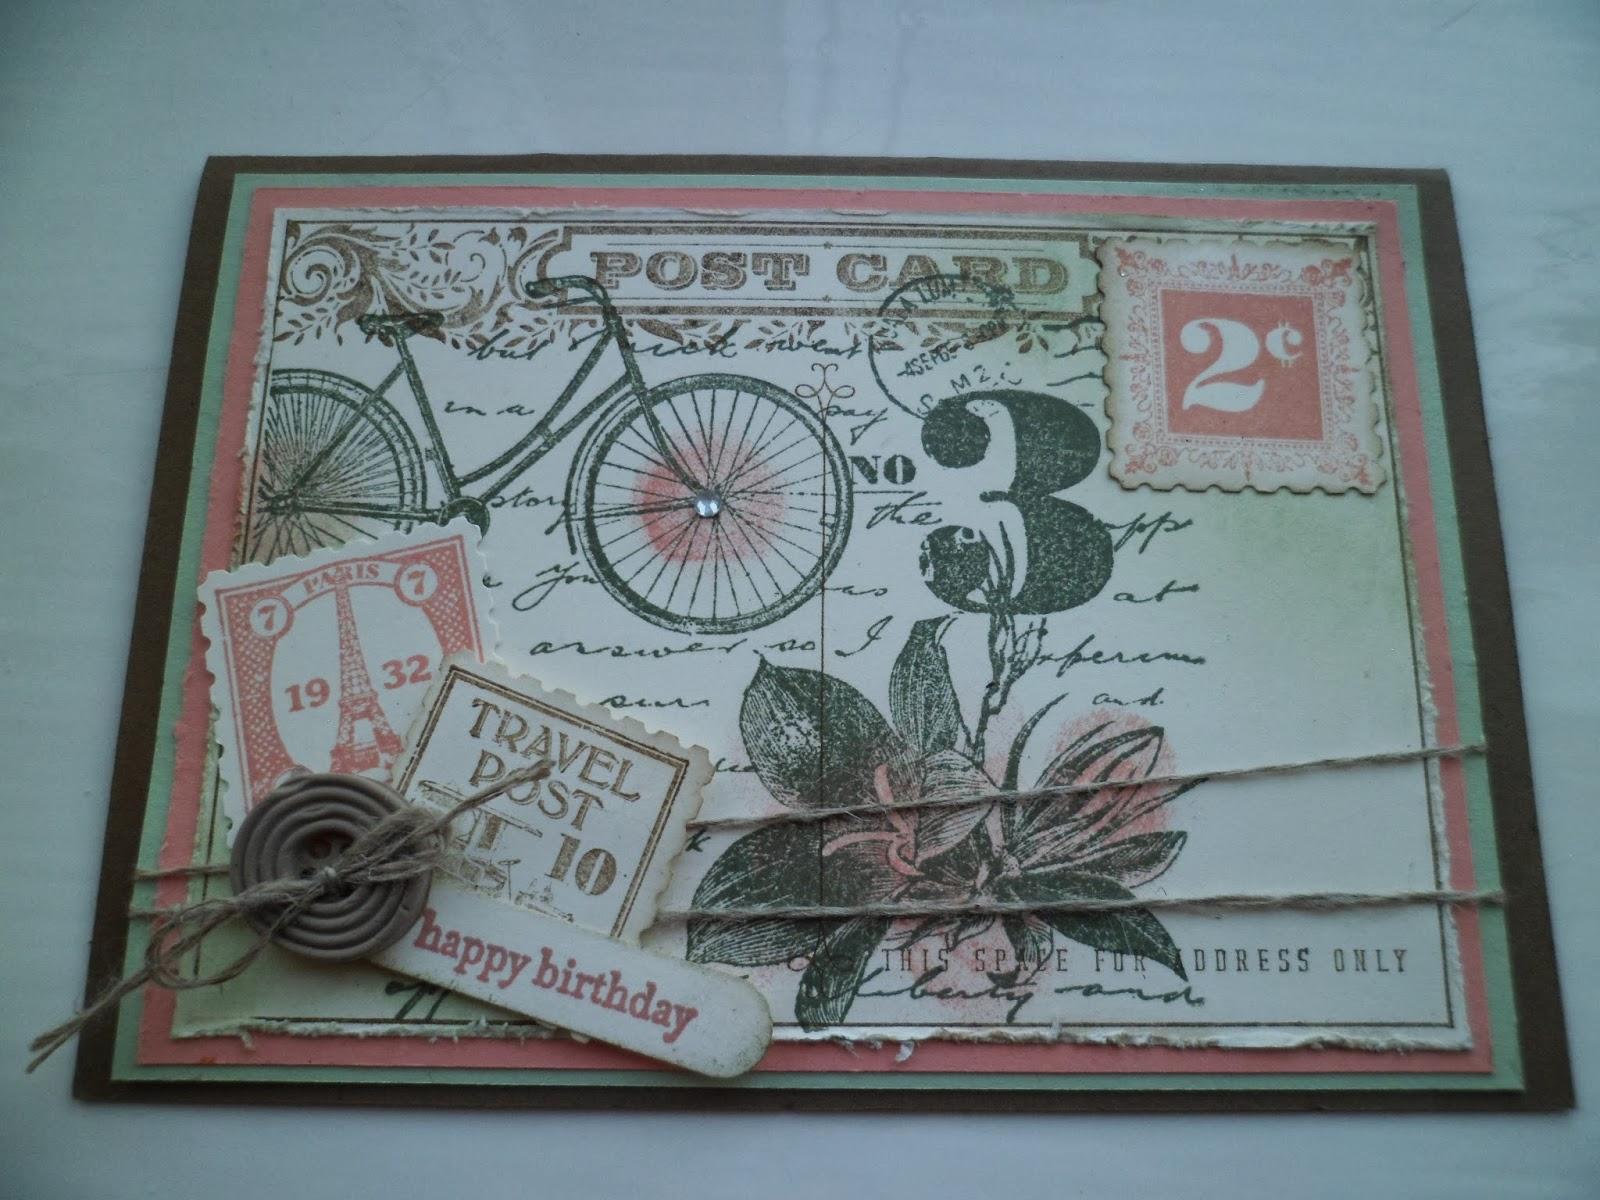 linda s craft room postage due postcard and secret garden twisted